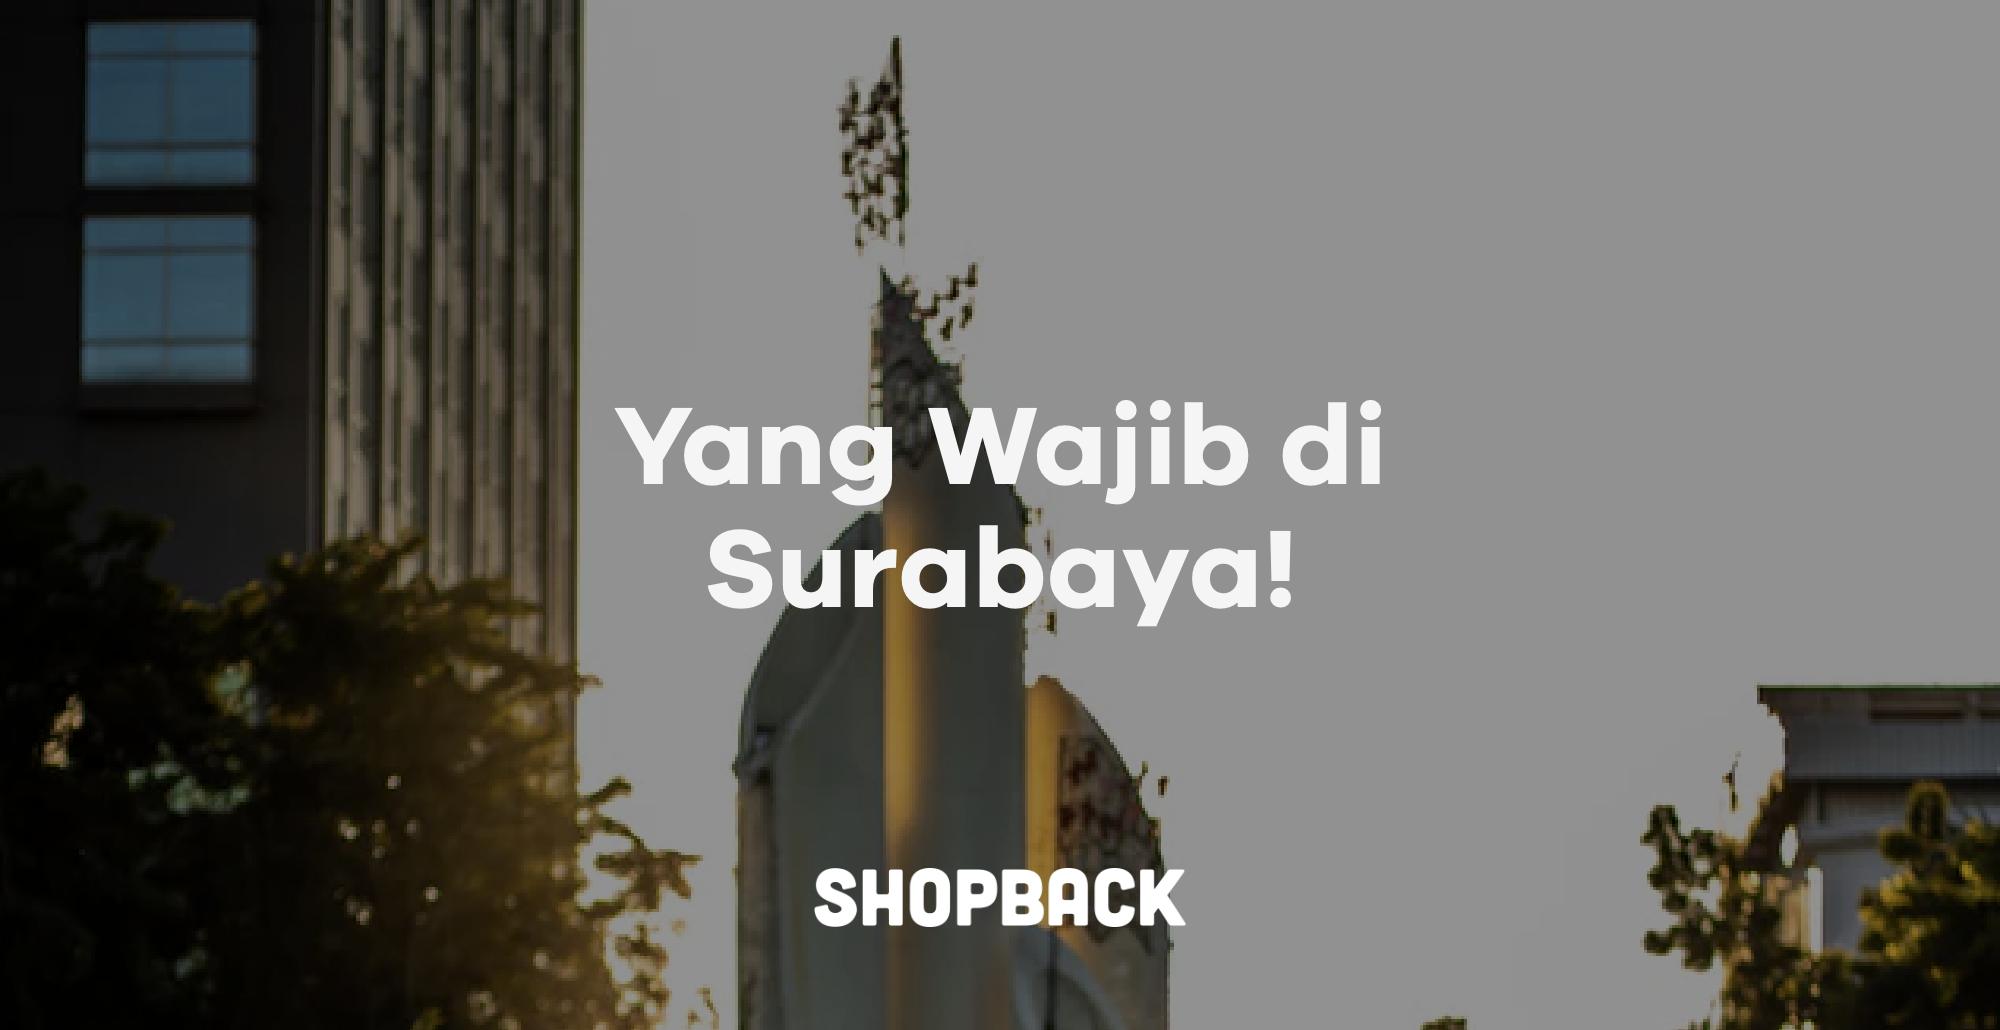 20 Tempat Wisata Di Surabaya Yang Sedang Hits Tahun 2019